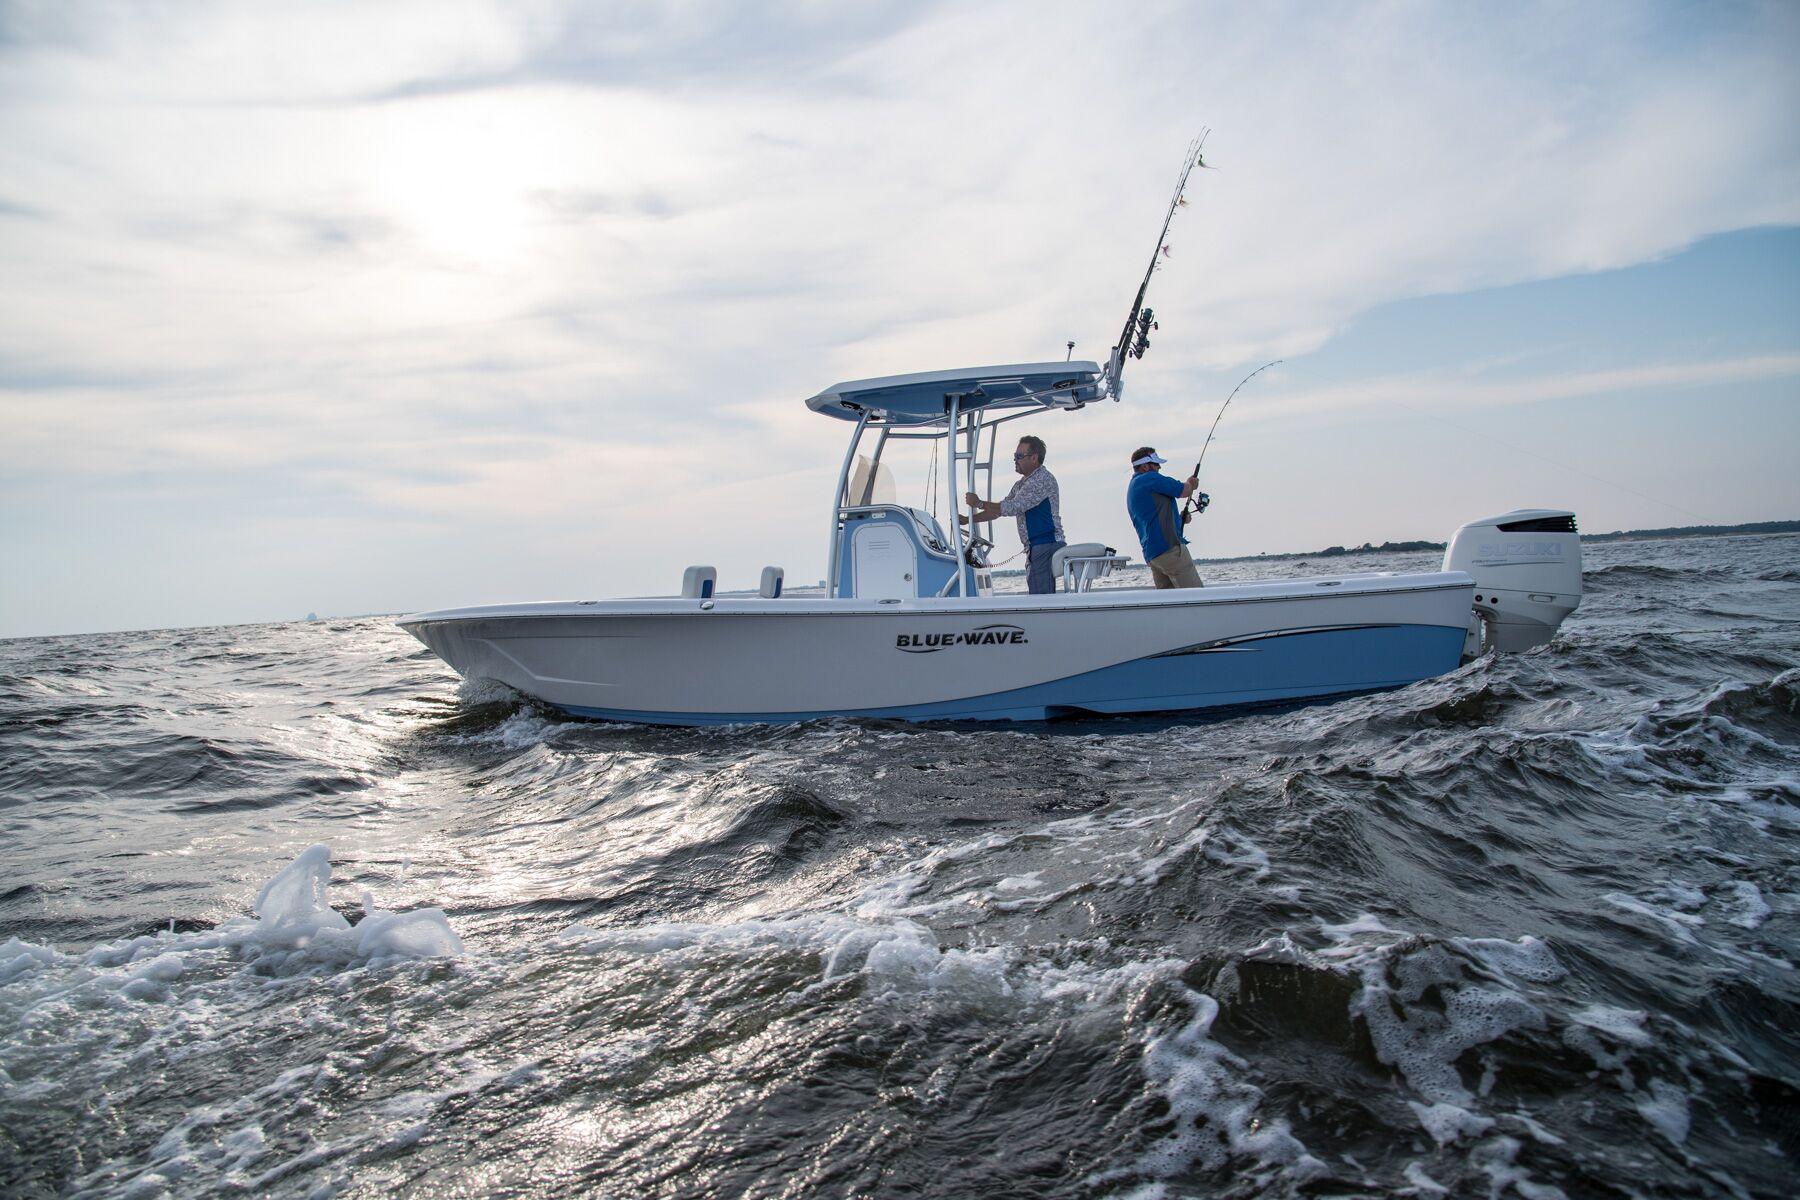 Blue boat photo